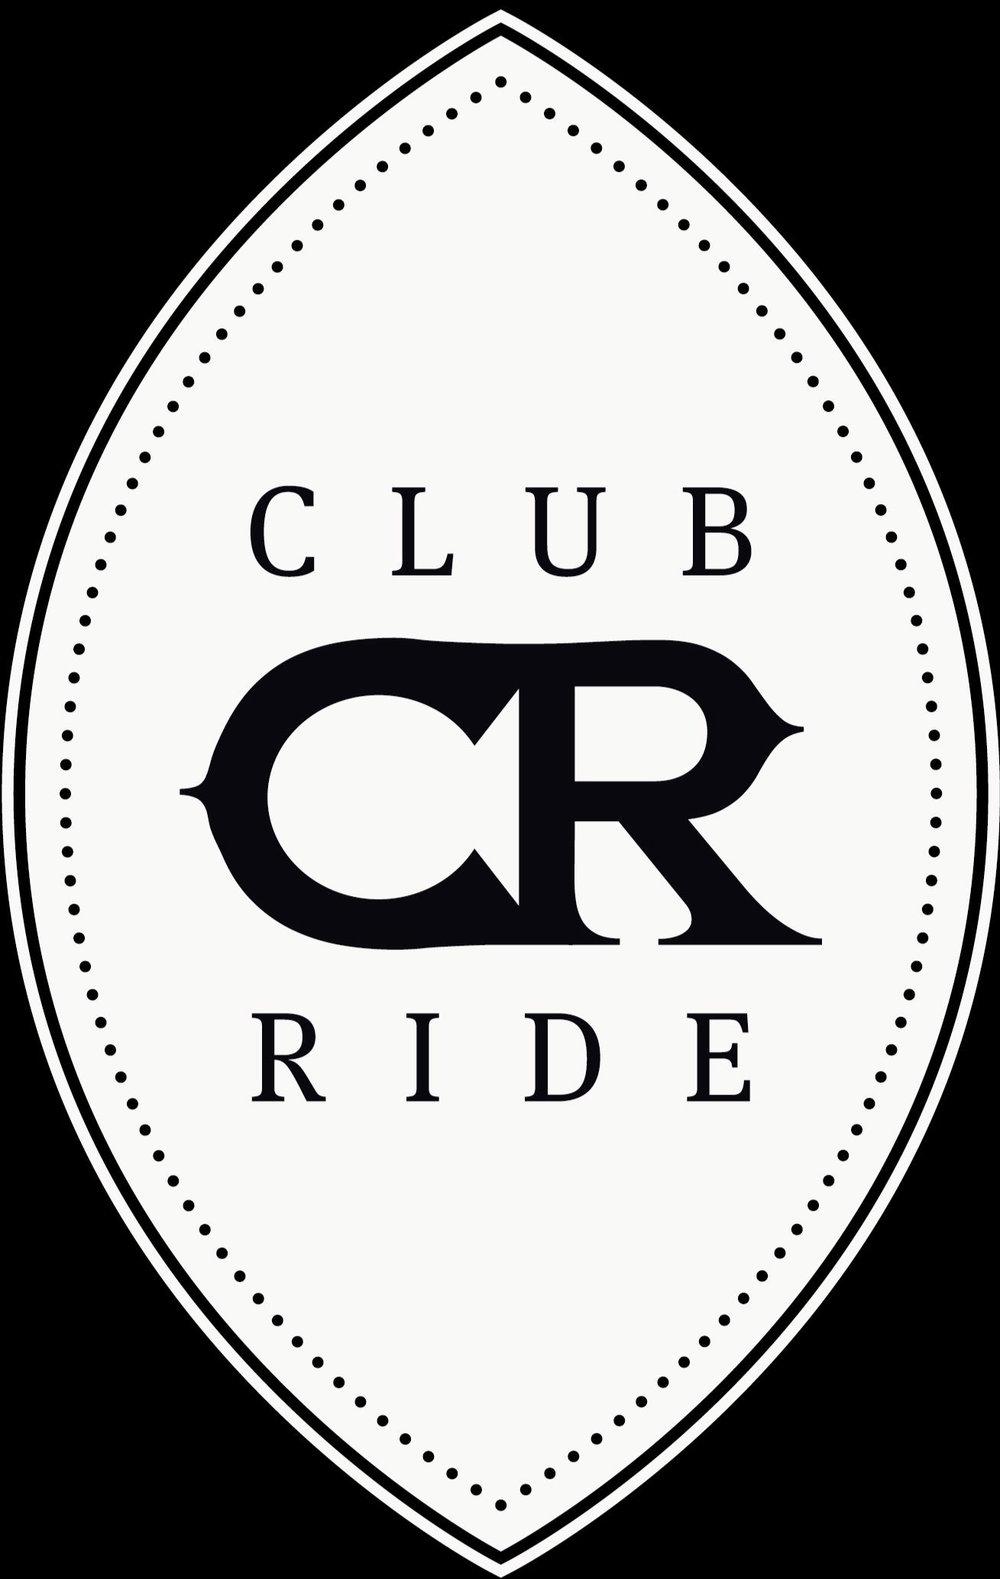 Club_Ride_Badge_Logo_Centered.jpg